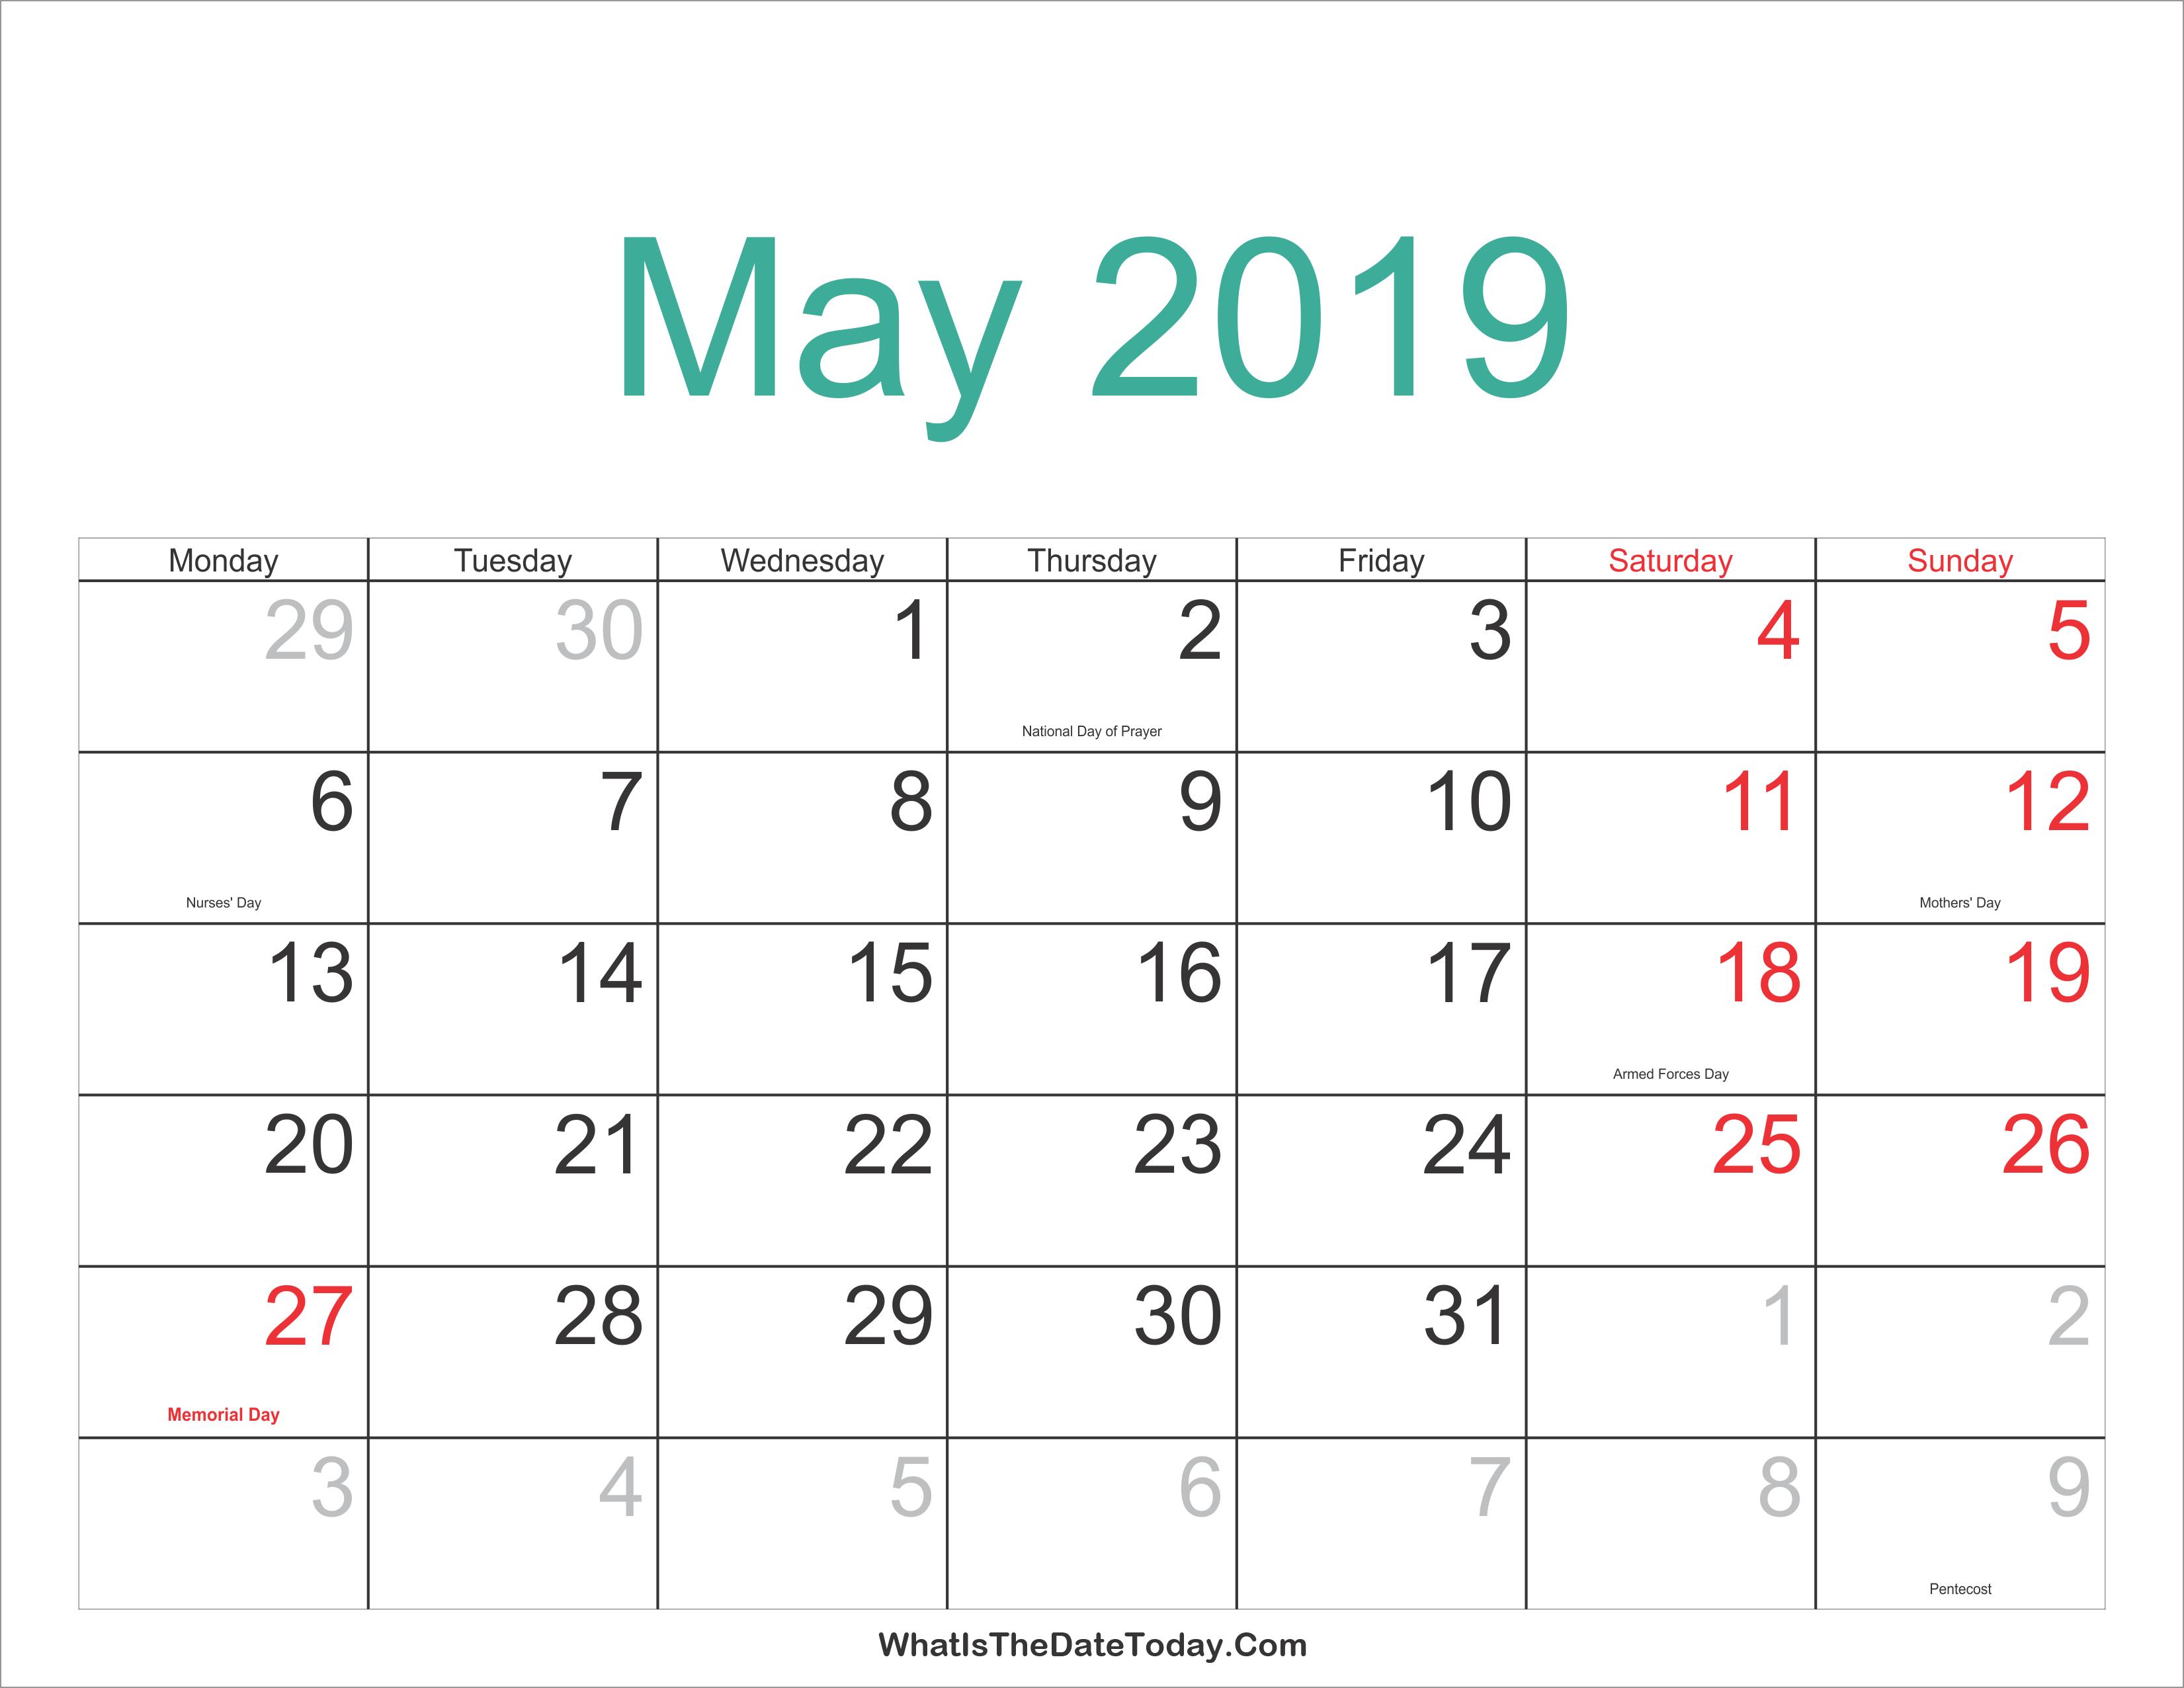 May 2019 Calendar With Holidays - Free Printable Calendar, Templates Calendar May 5Th 2019